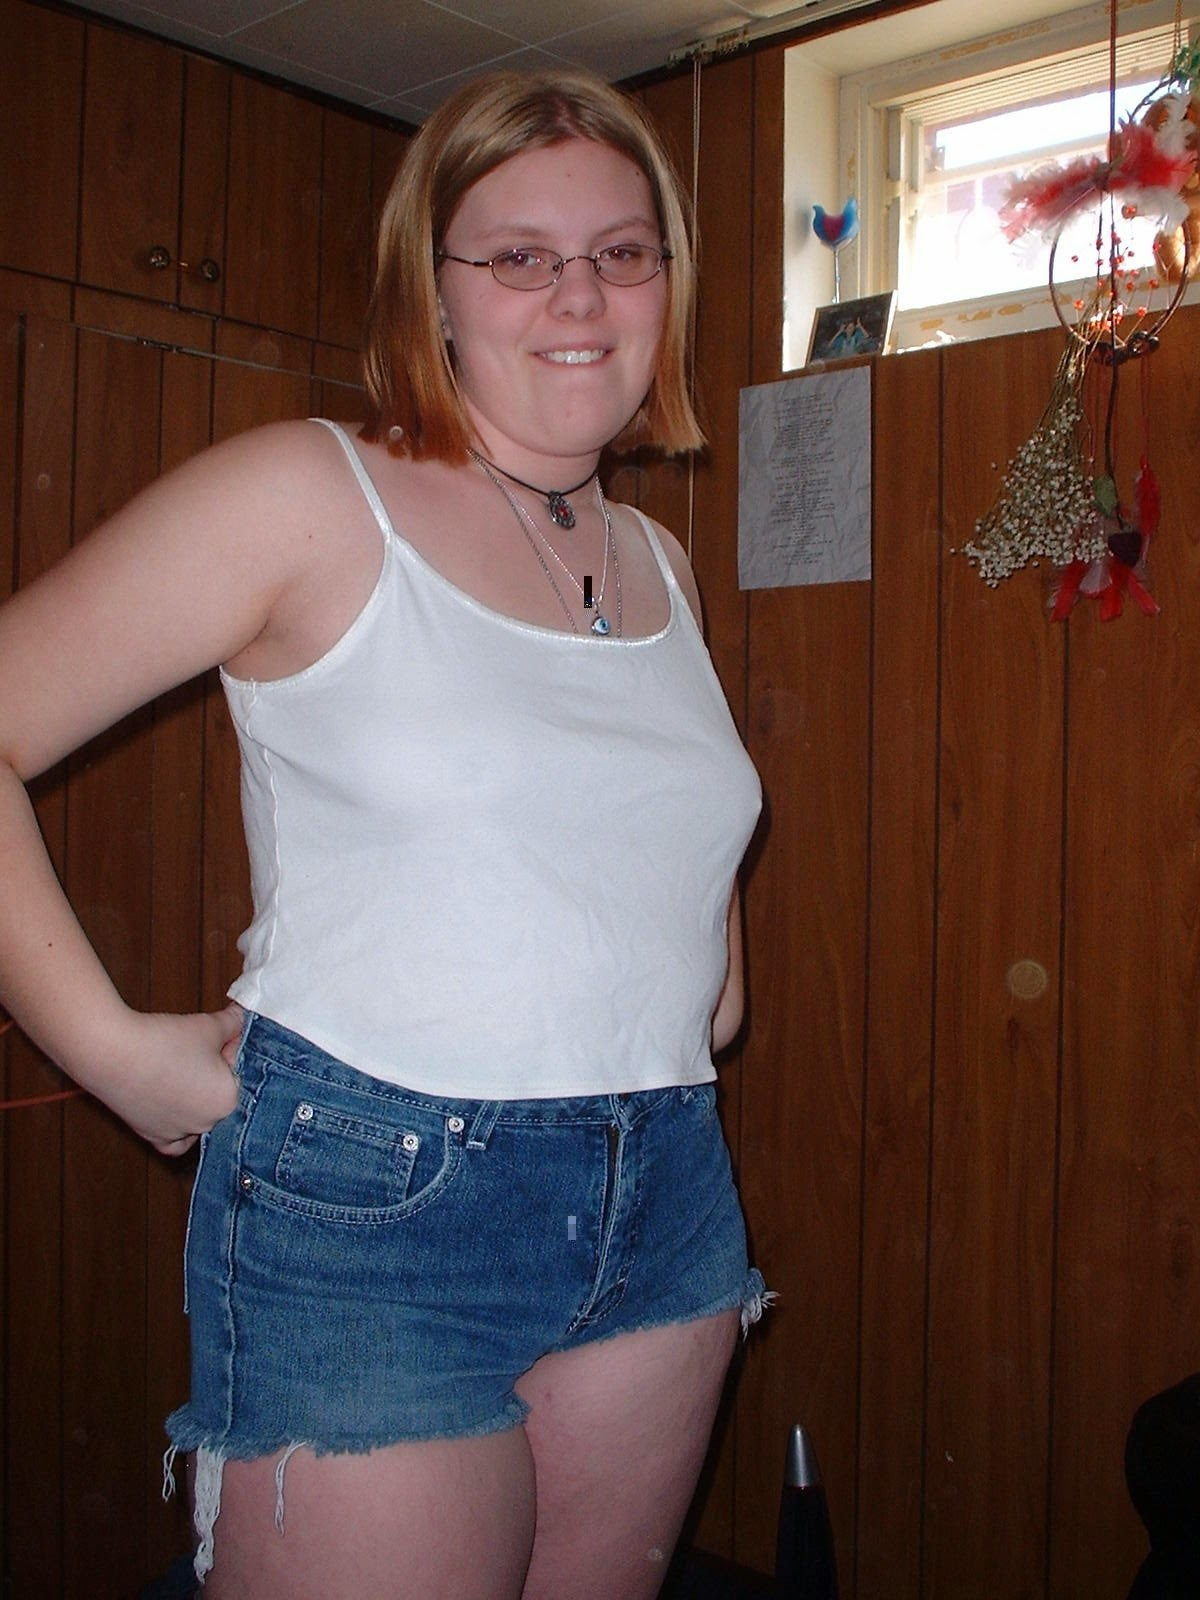 chubby-chunky-big-naked-teen-girls-belgium-milfs-nude